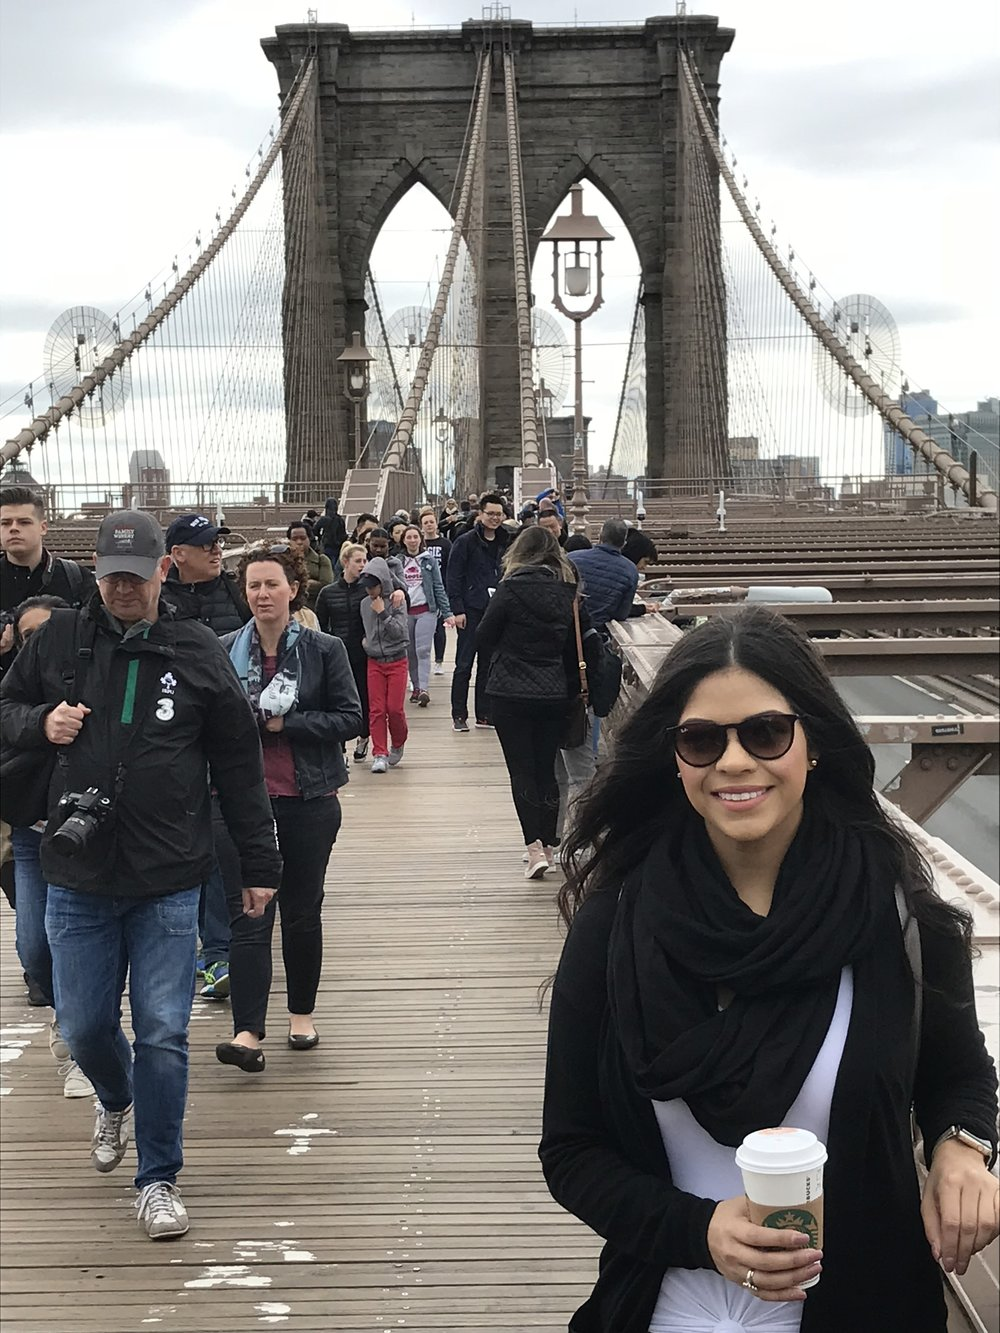 Walked across the Brooklyn Bridge